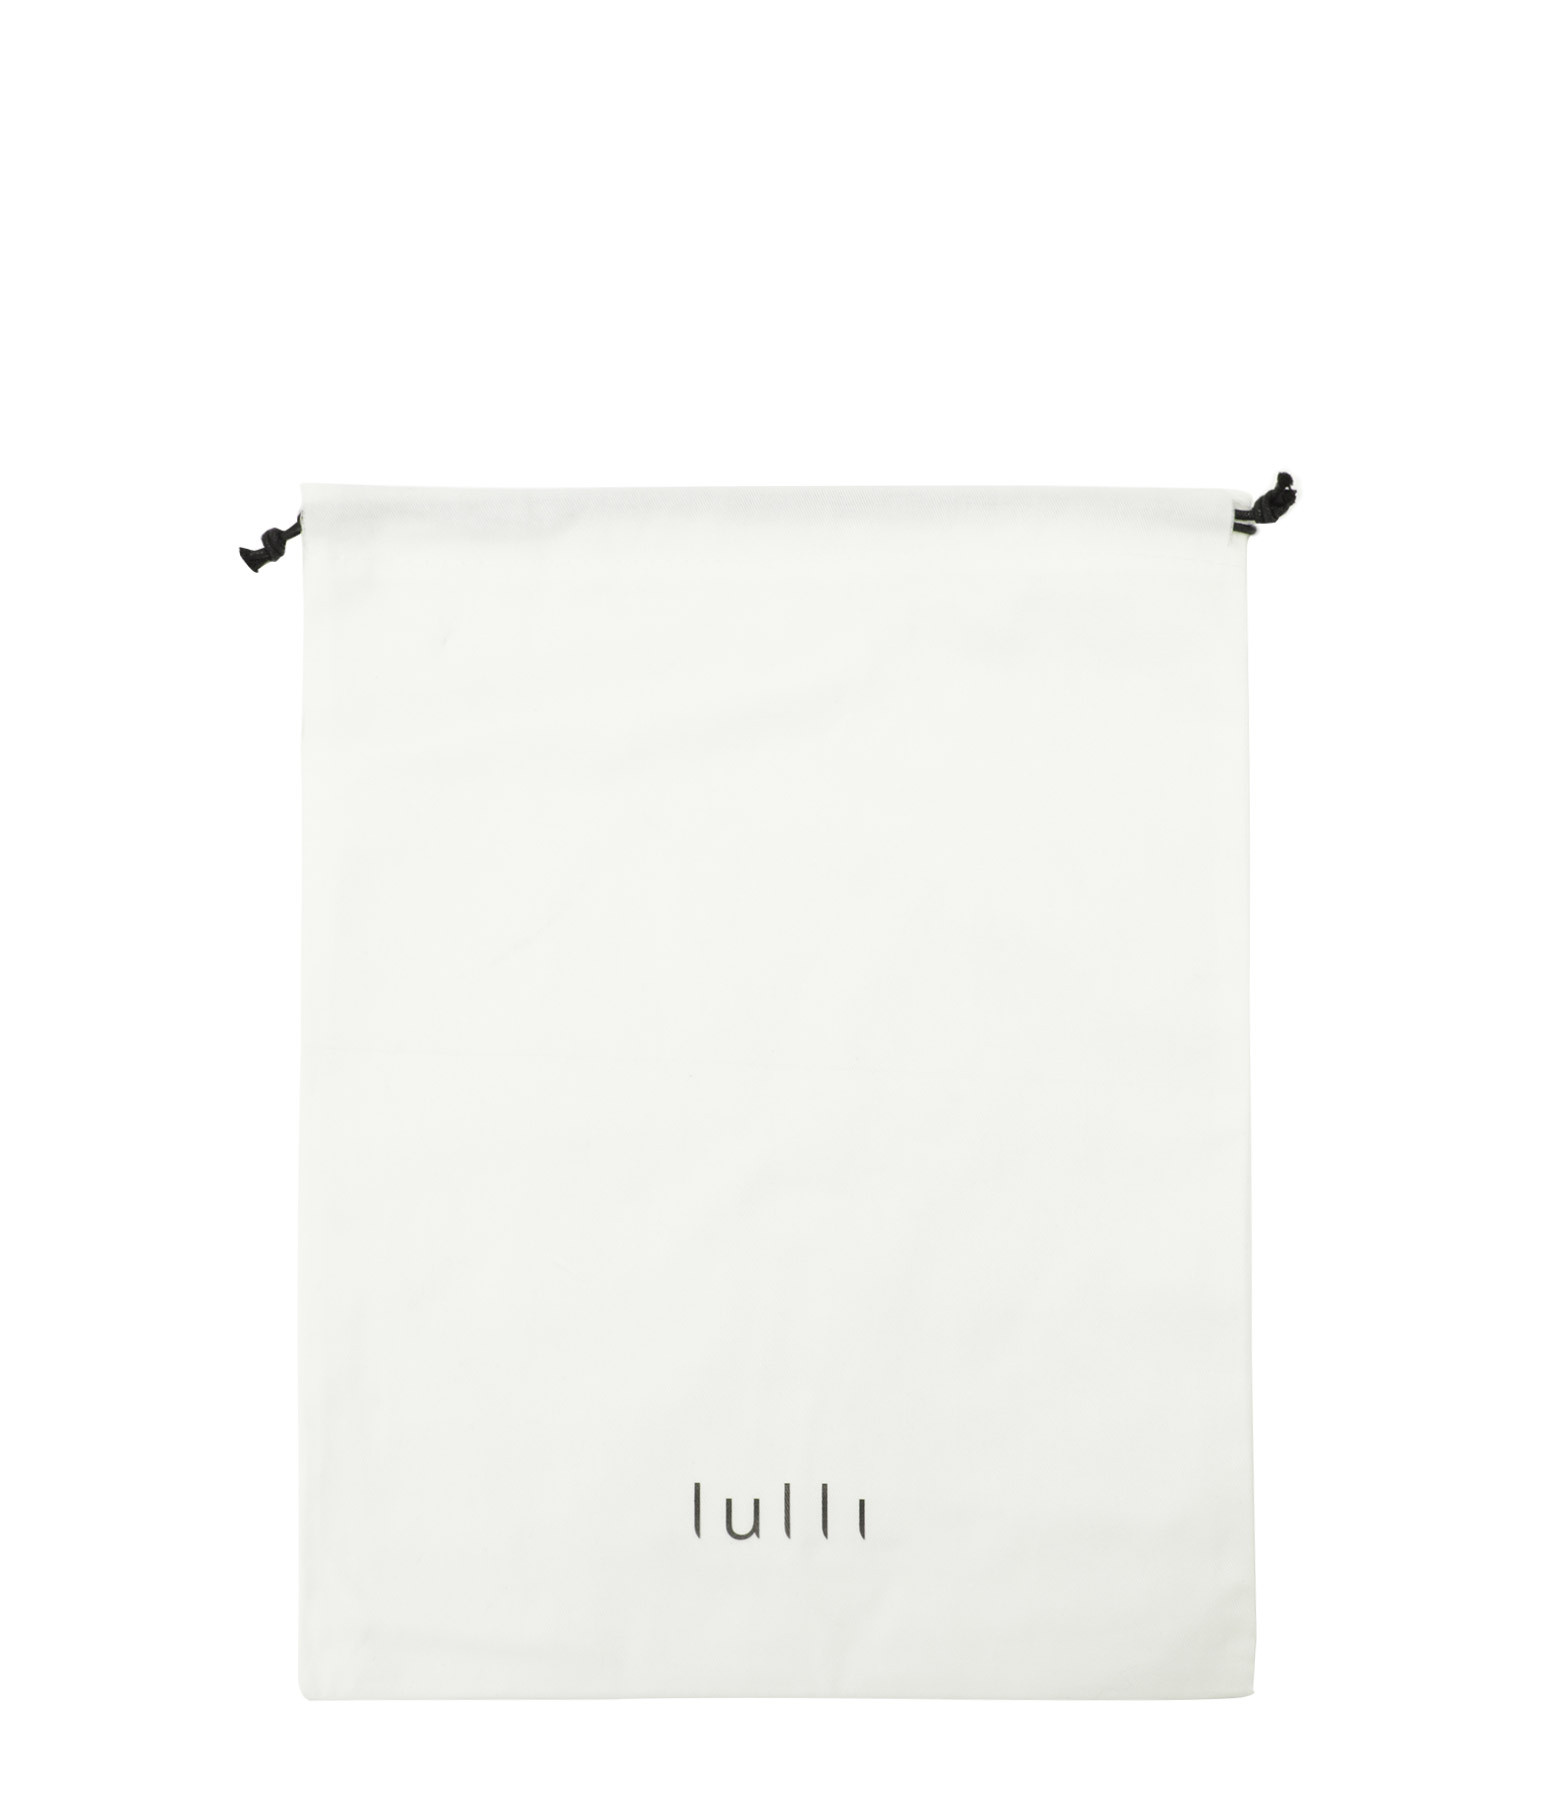 LULLI - Pochette Coton 30x40cm Imprimé Lulli